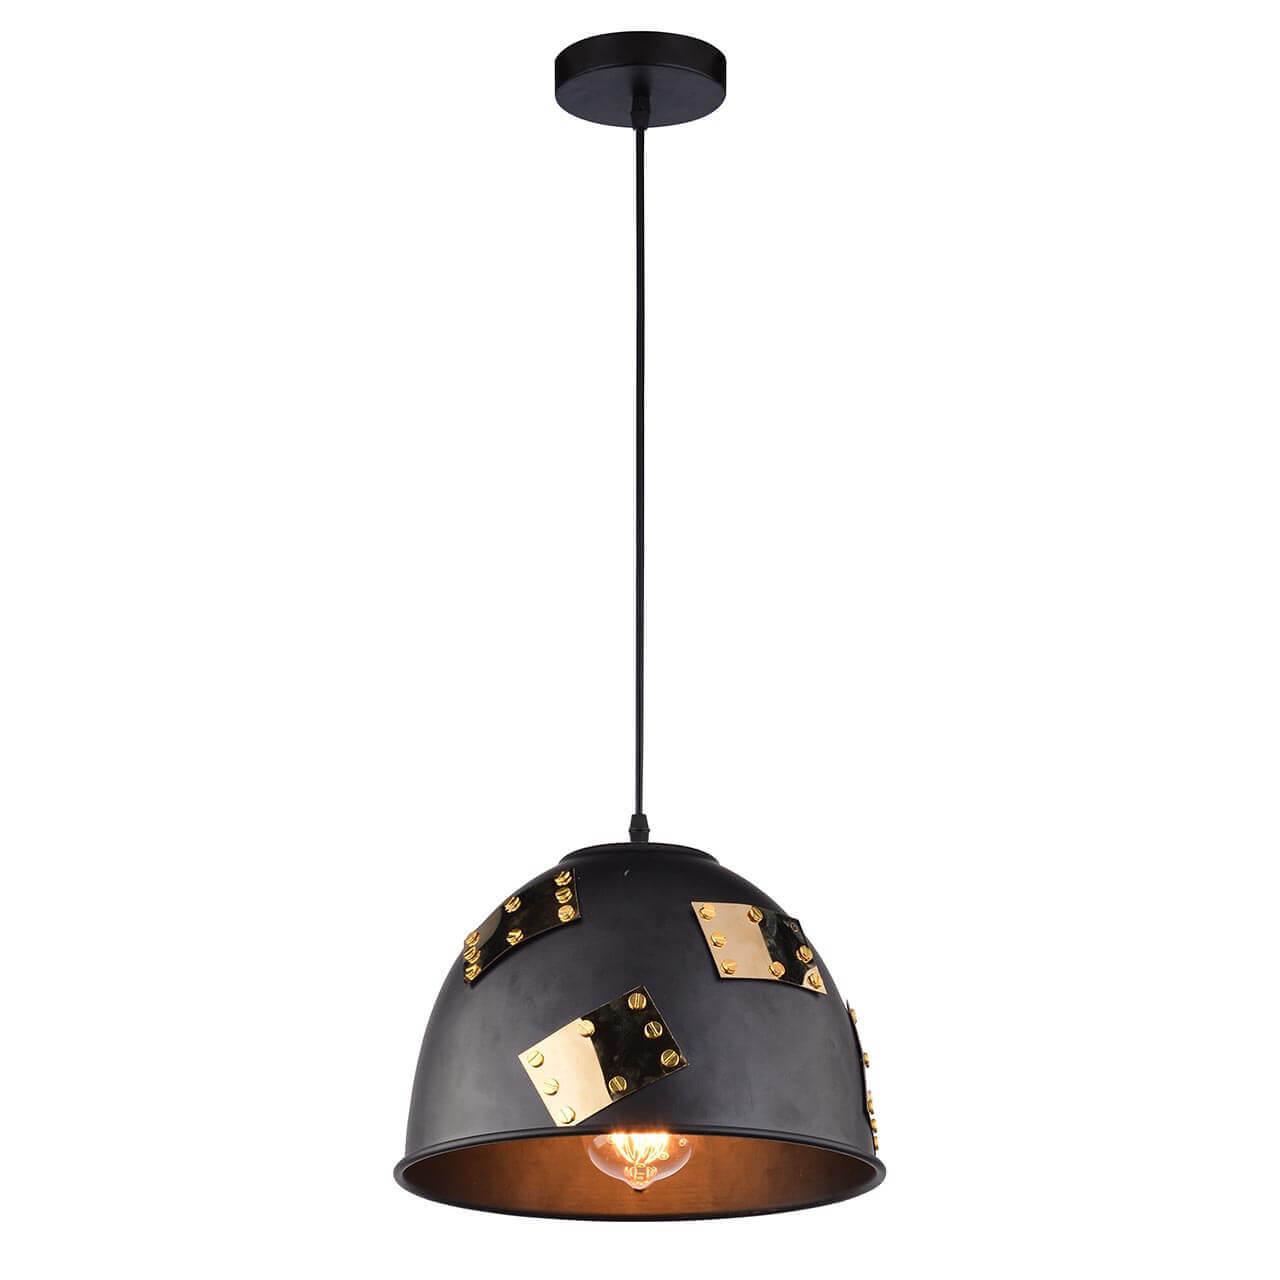 Светильник Arte Lamp A6023SP-1BK Eurica светильник arte lamp a4248sp 1bk eurica